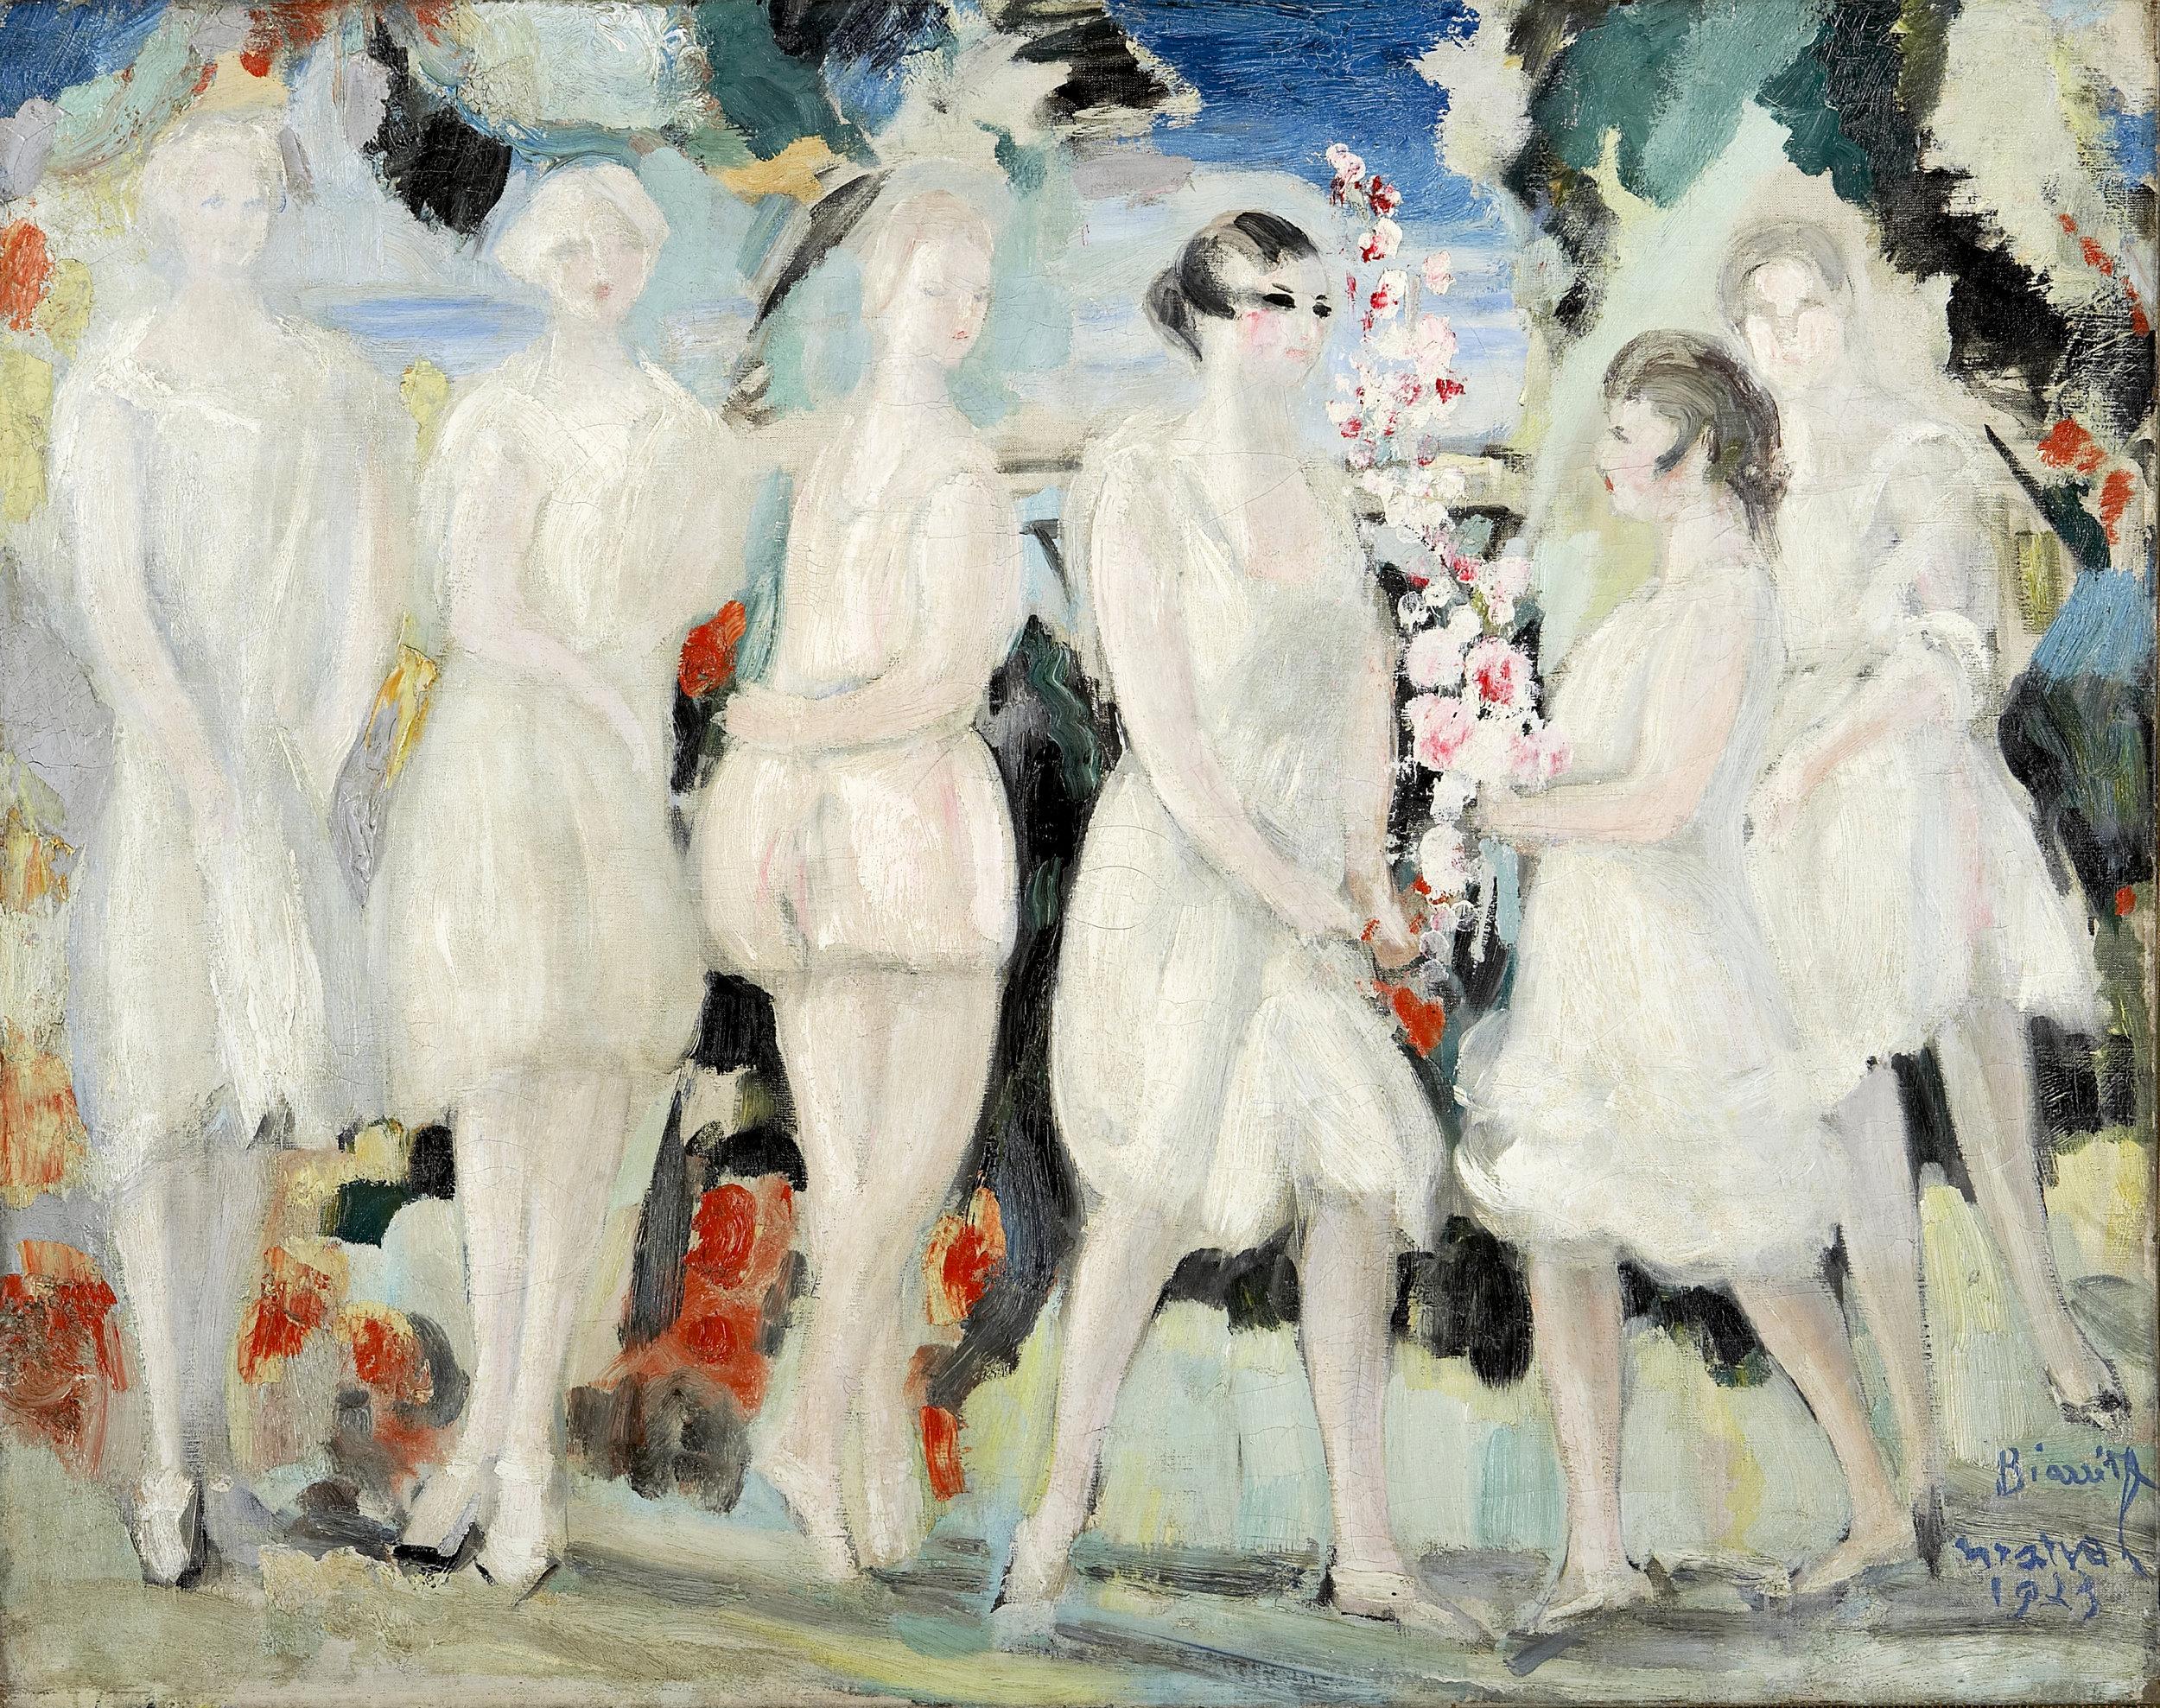 Jardin de mon Voisin, Jacqueline Marval, 1923